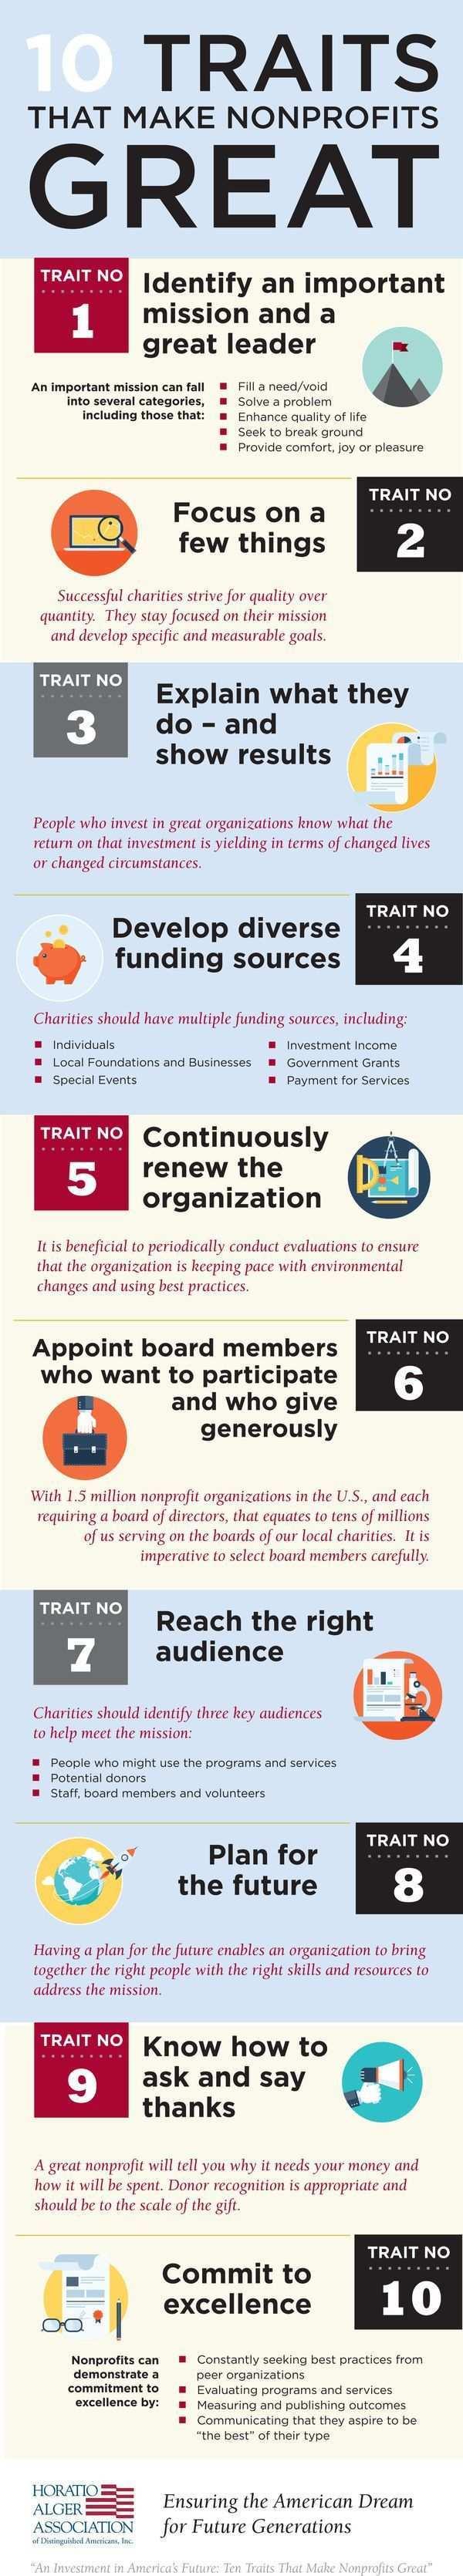 Infographic 10 Traits That Make Nonprofits Great Philantopic Pnd Foundation Center Nonprofit Infographics Nonprofit Management Nonprofit Marketing